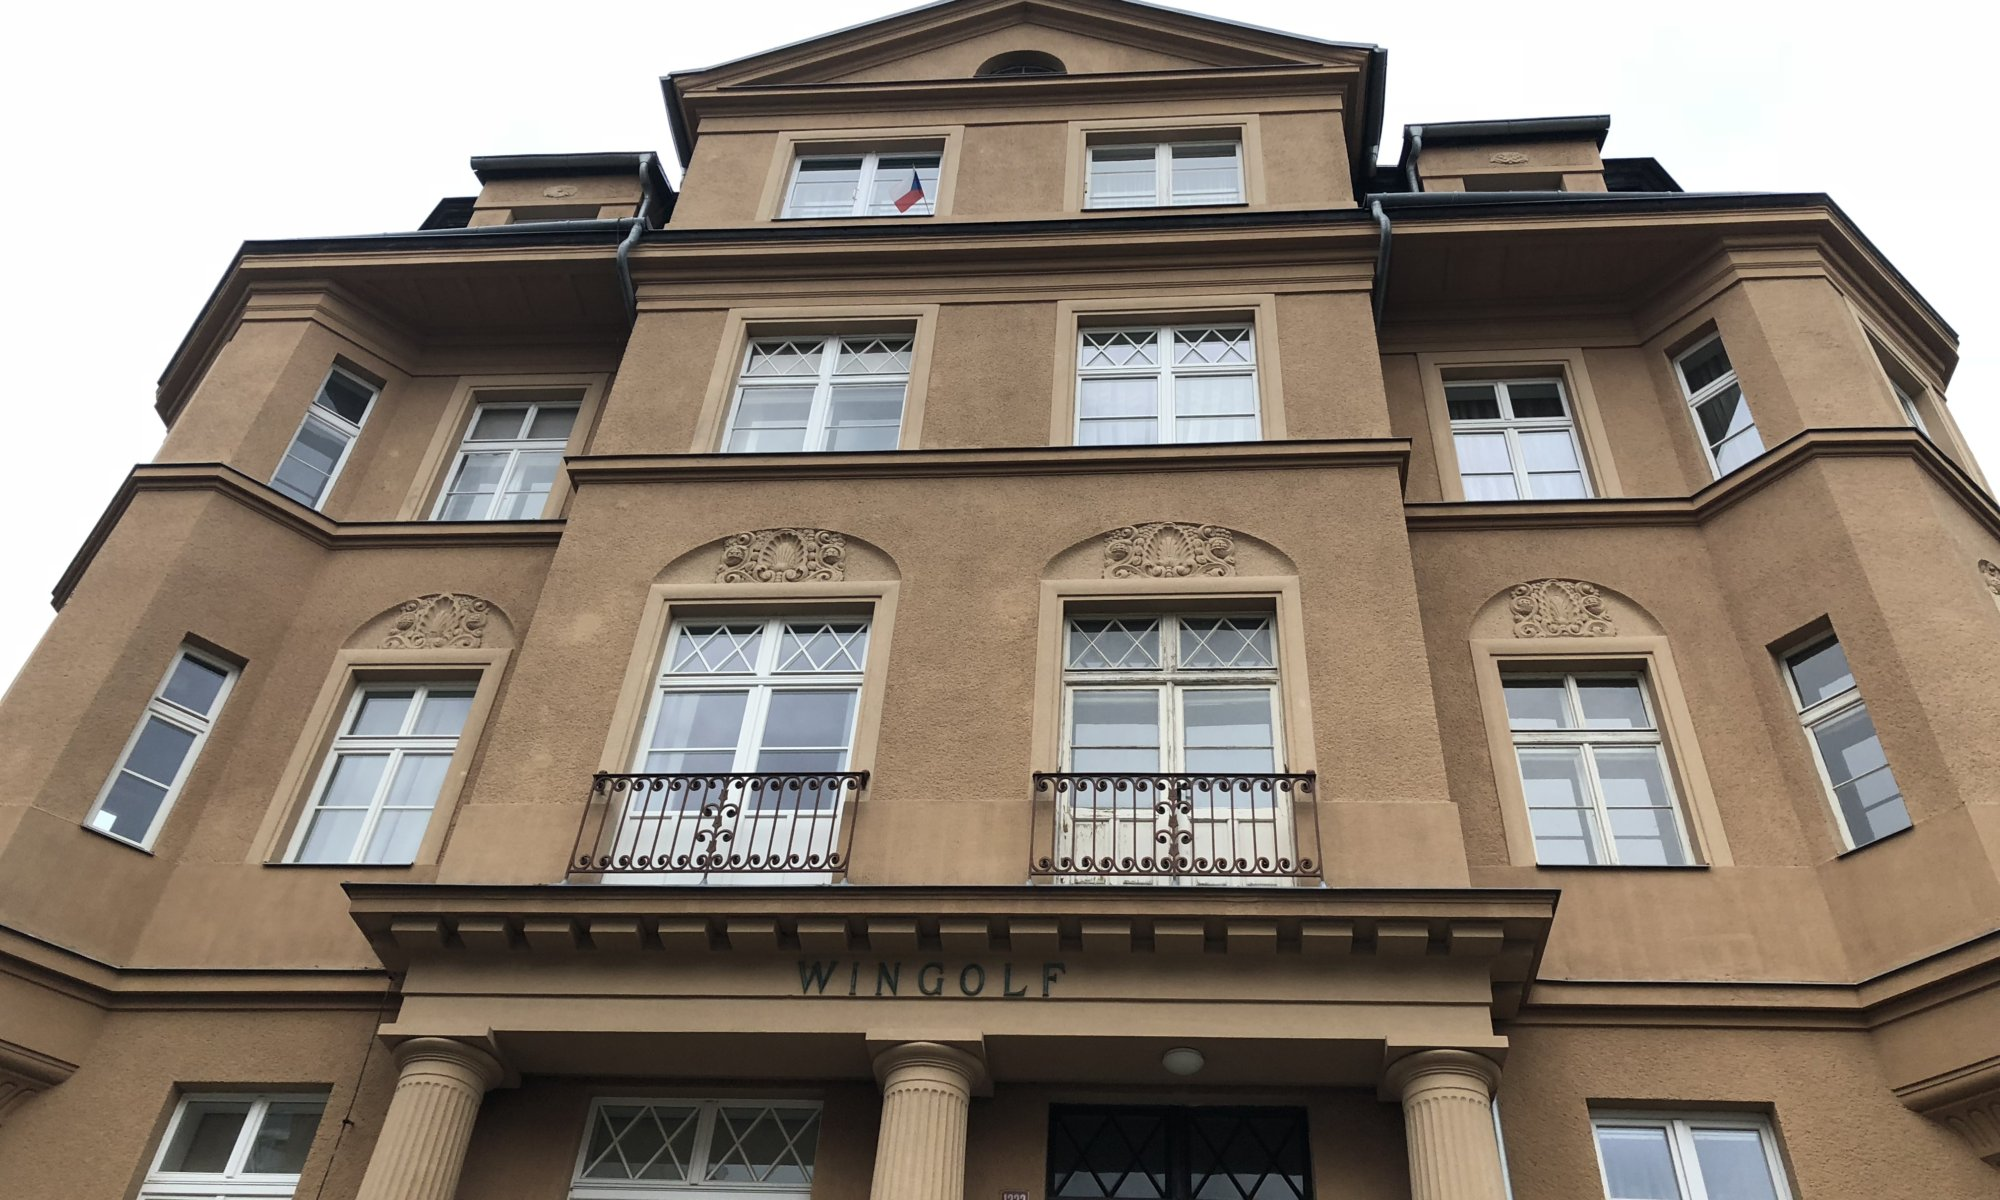 Villa Wingolf, Karlovy Vary